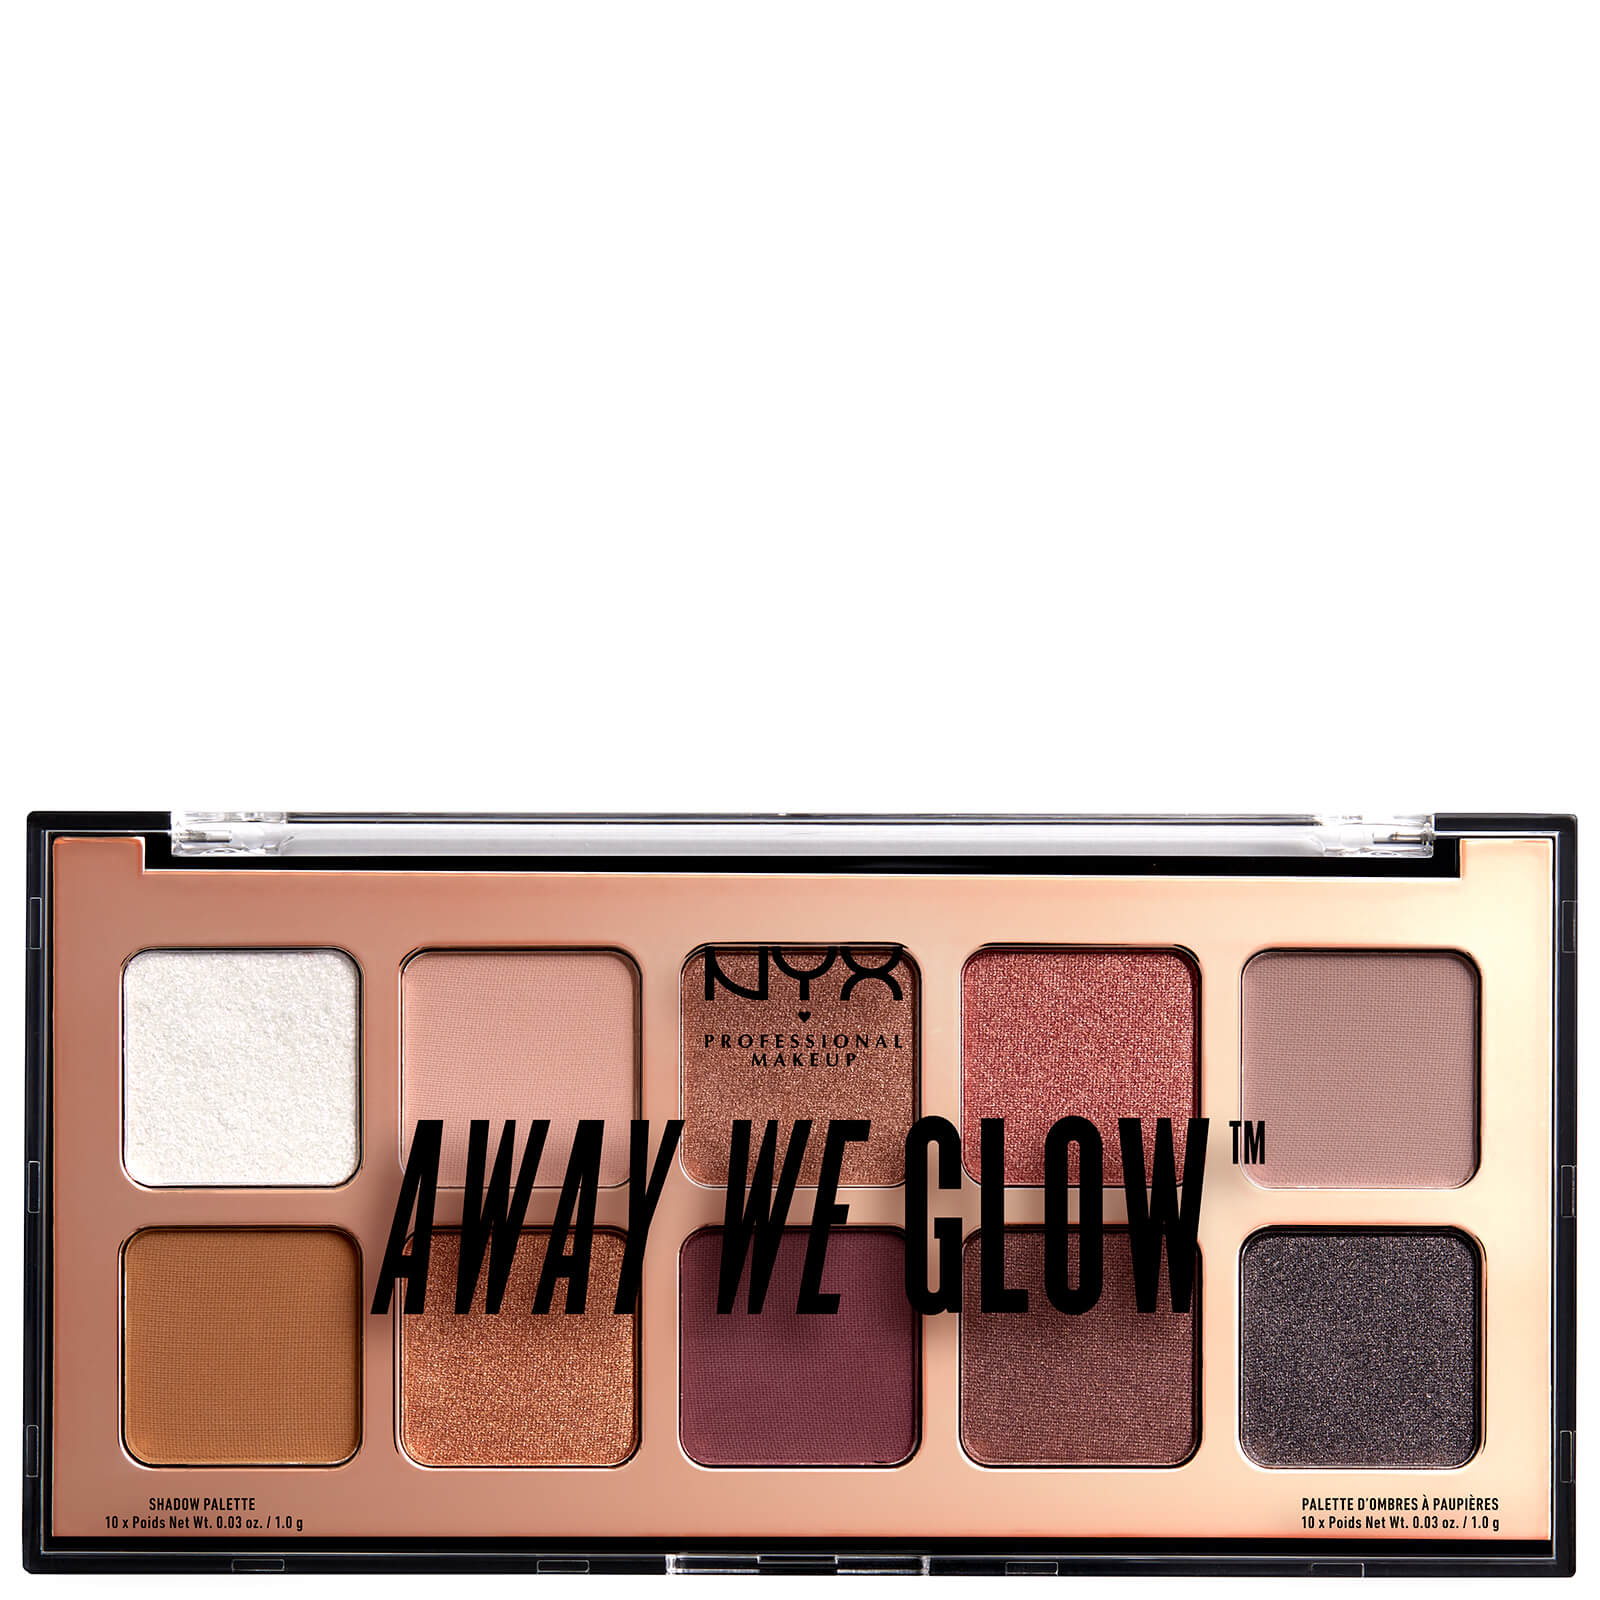 Купить Тени для век NYX Professional Makeup Away We Glow Shadow Palette 10 г - Lovebeam